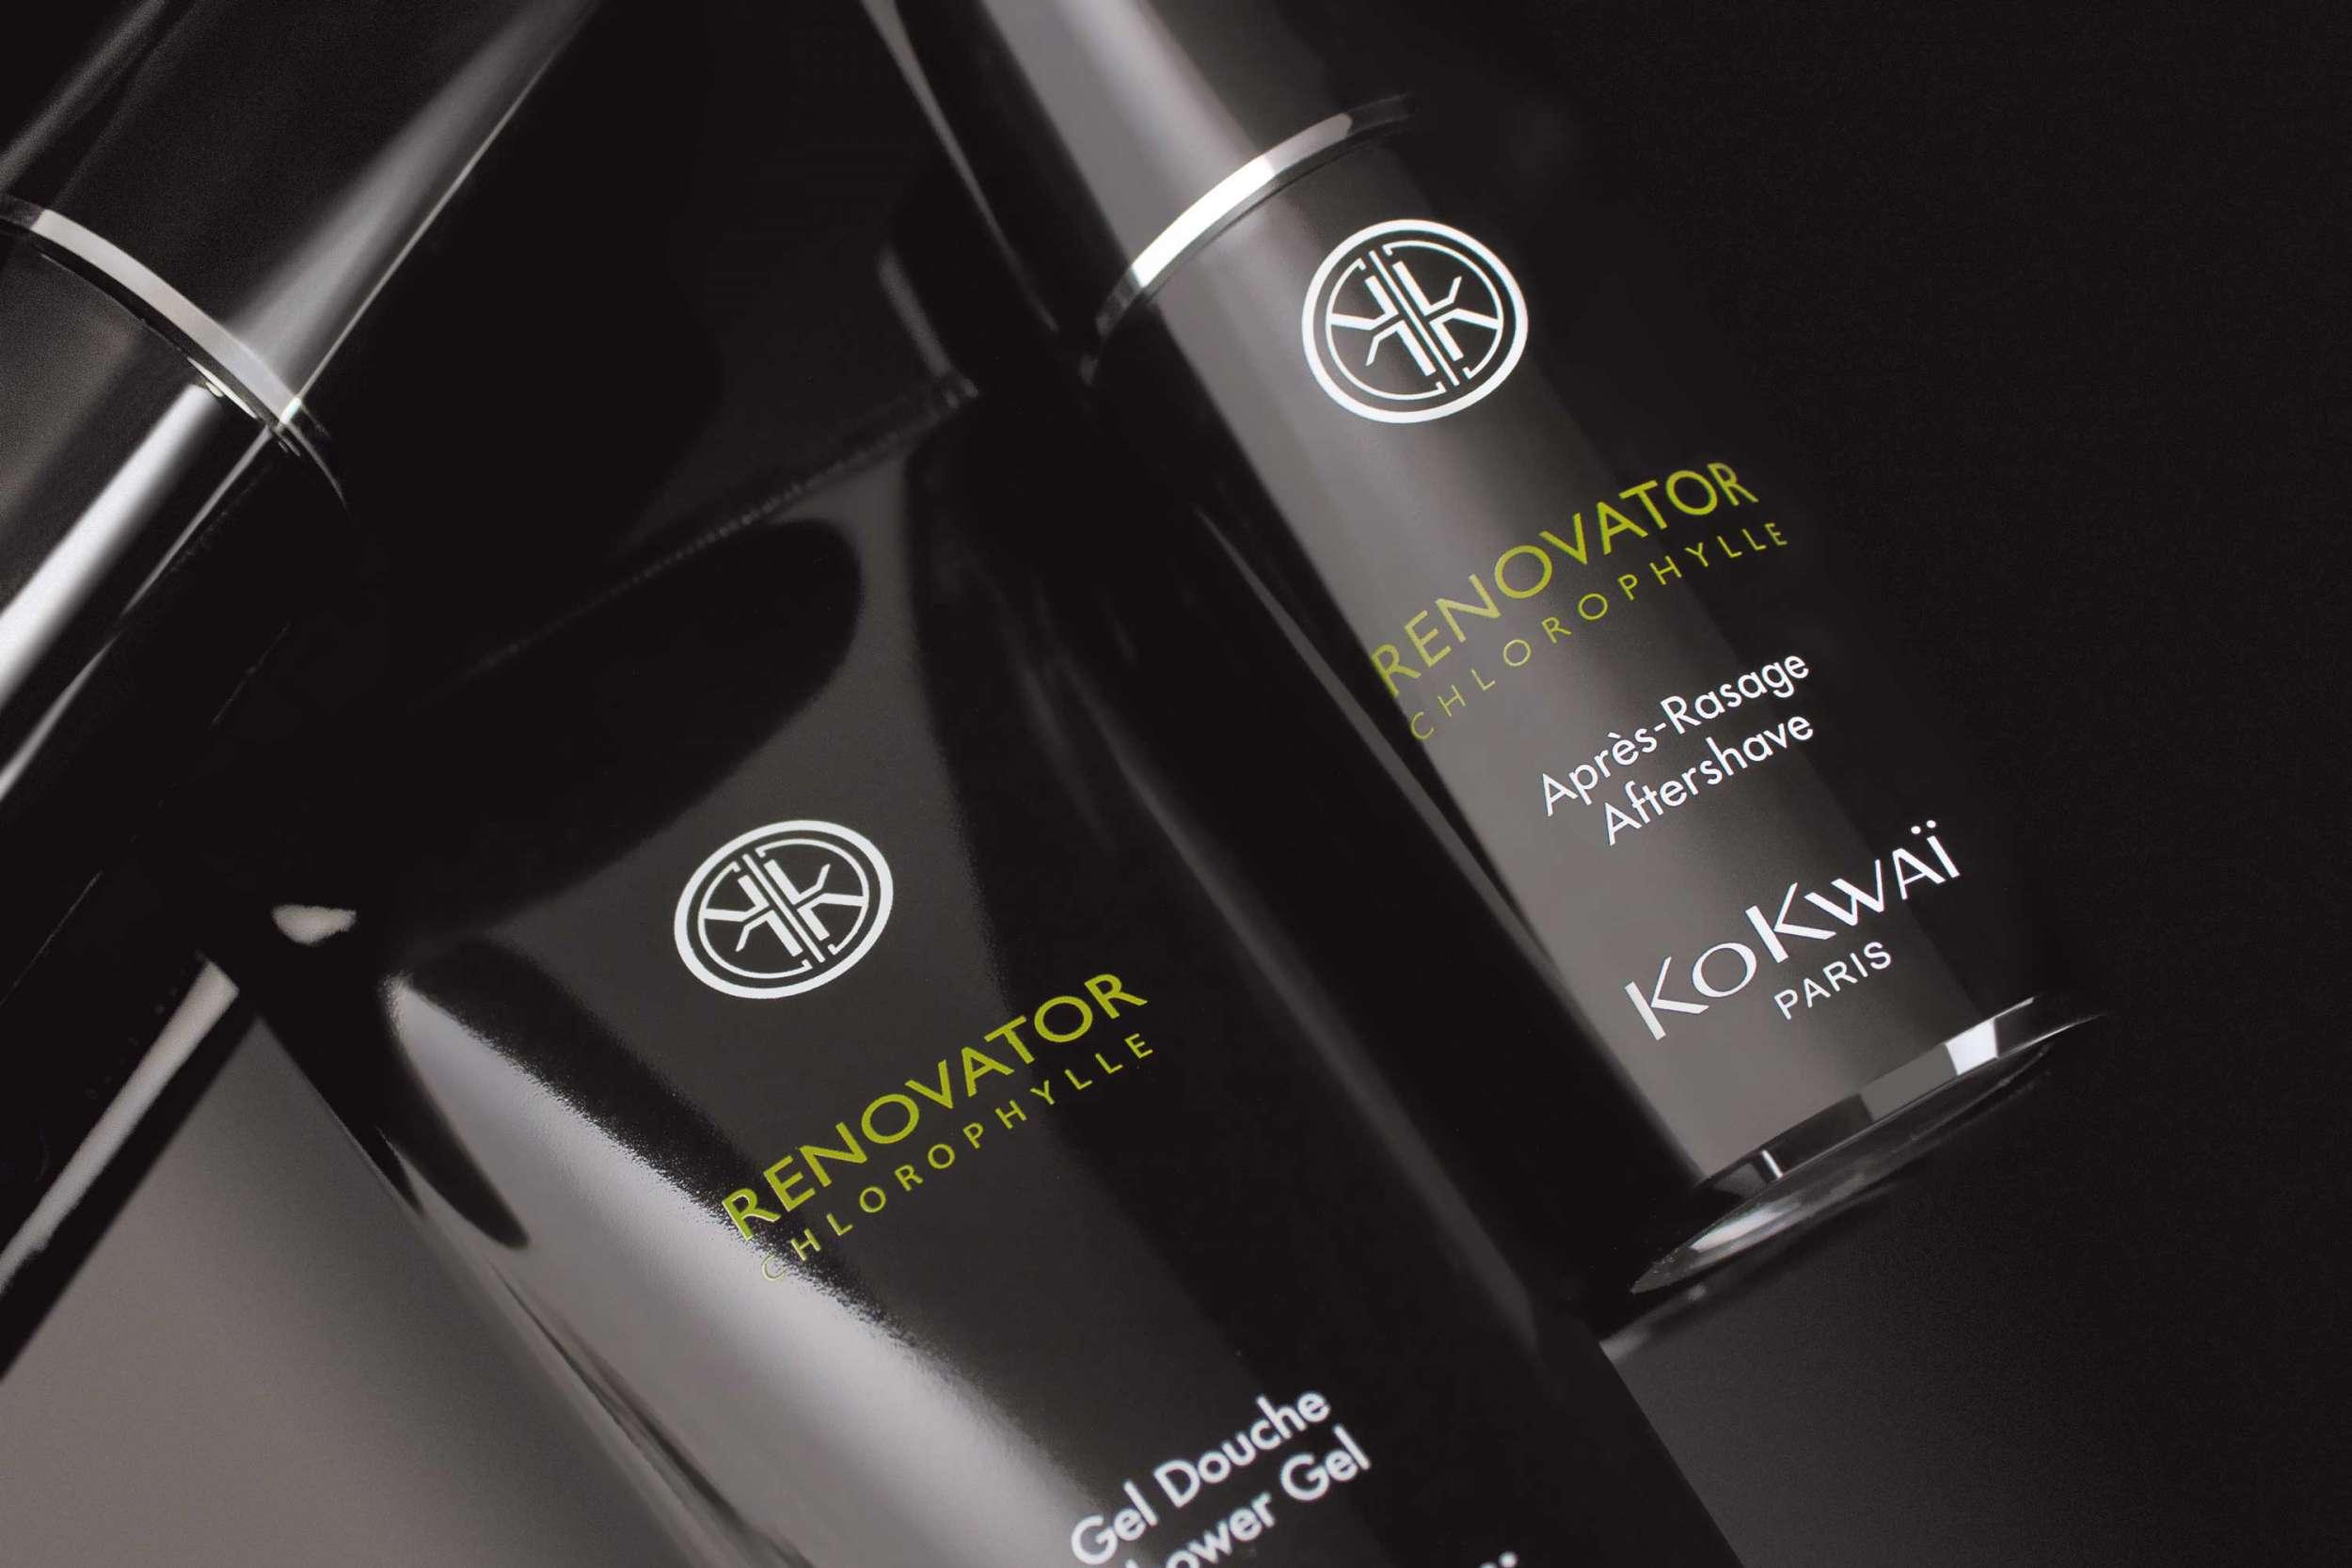 KOKWAI-Produits-Soins-cosmetiques-0069.jpg